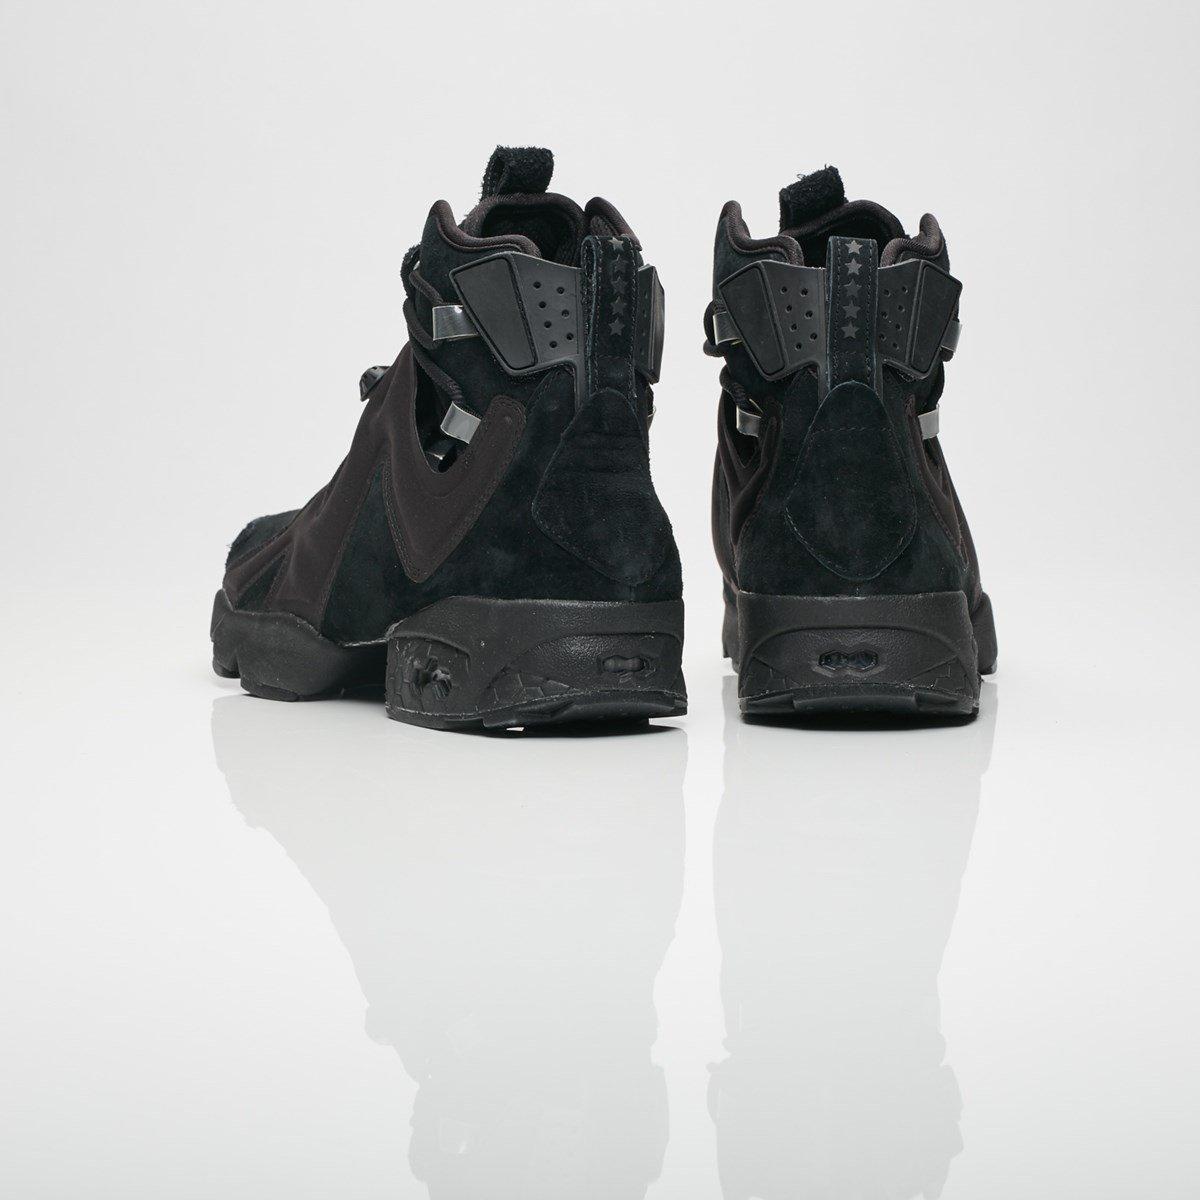 Reebok Pump furikaze-Future-BS7420 Sneaker Shoes Black Limited New